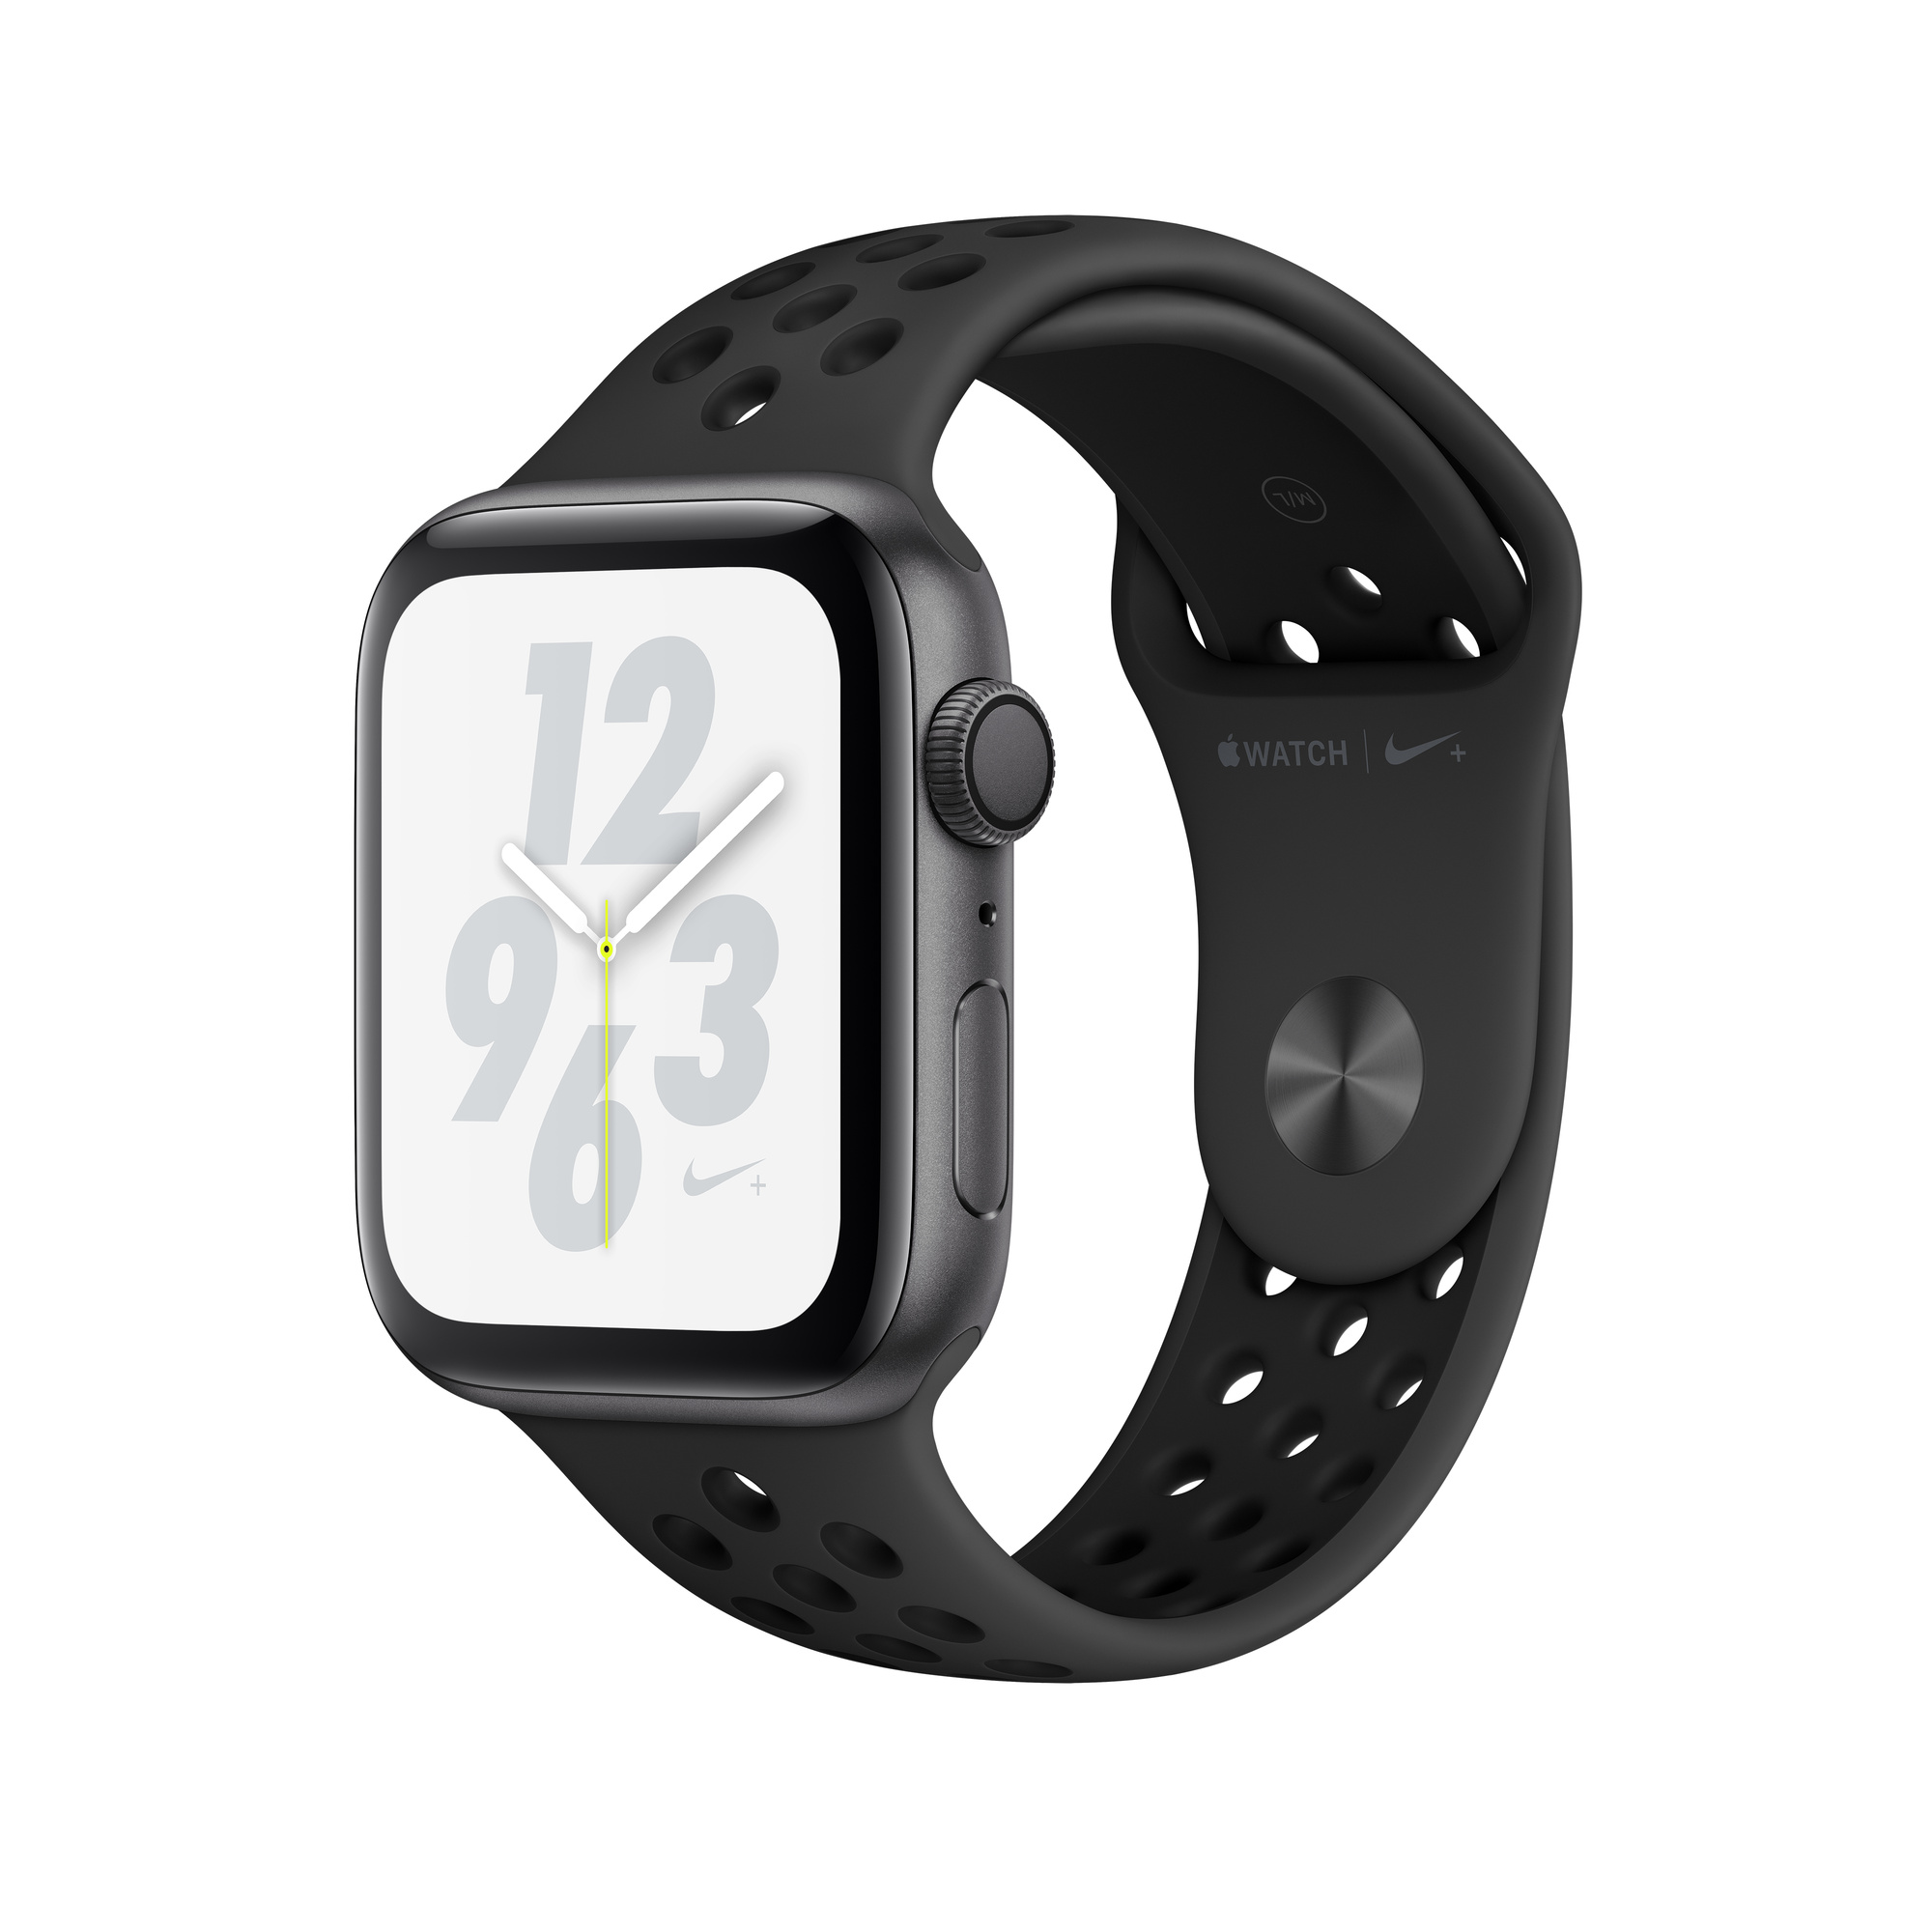 Recitar pereza en progreso  Refurbished Apple Watch Nike+ Series 4 GPS, 44mm Space Gray Aluminum Case  with Anthracite/Black Nike Sport Band - Apple